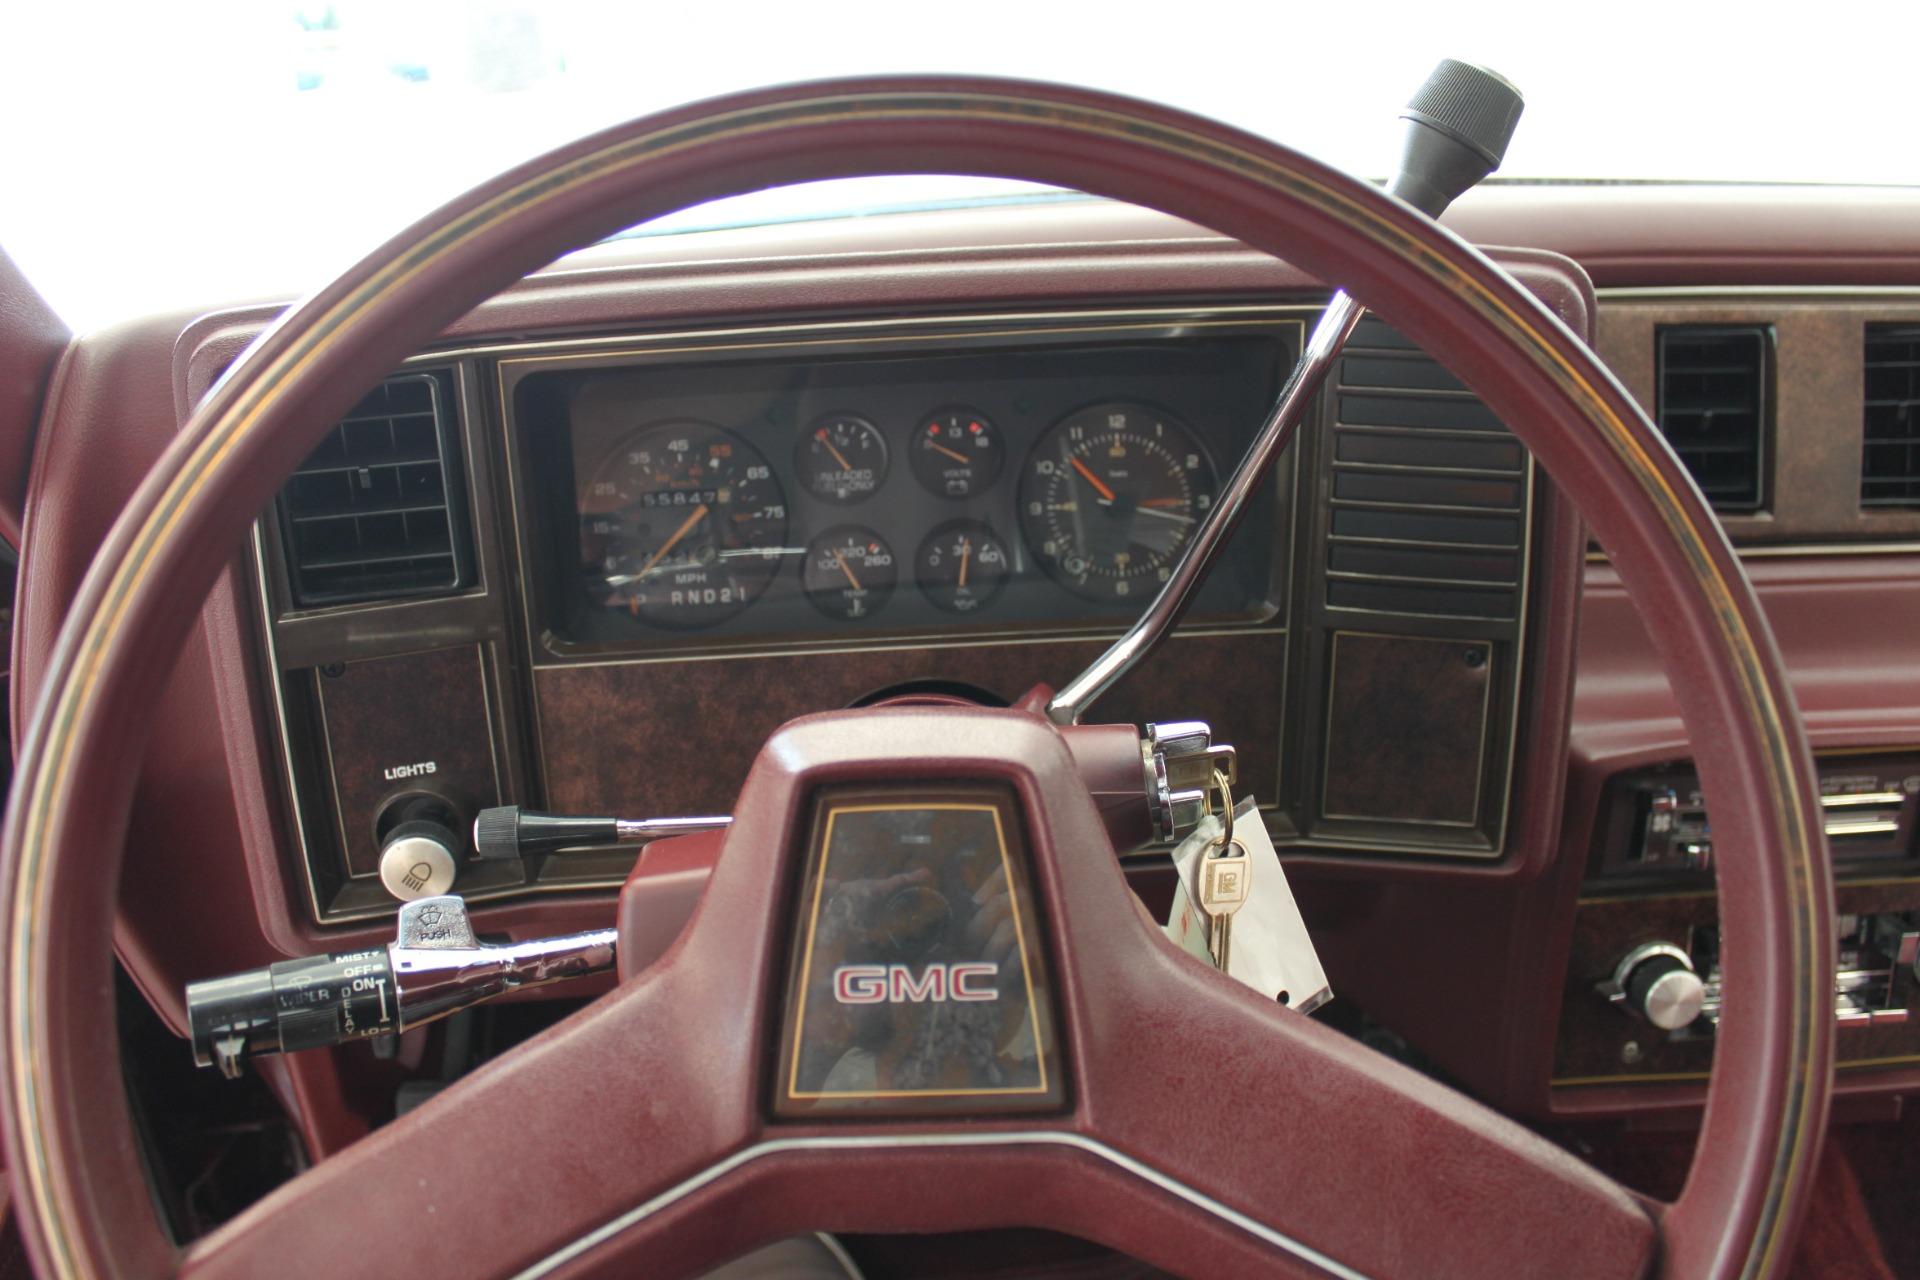 Used-1984-GMC-Caballero-Lexus